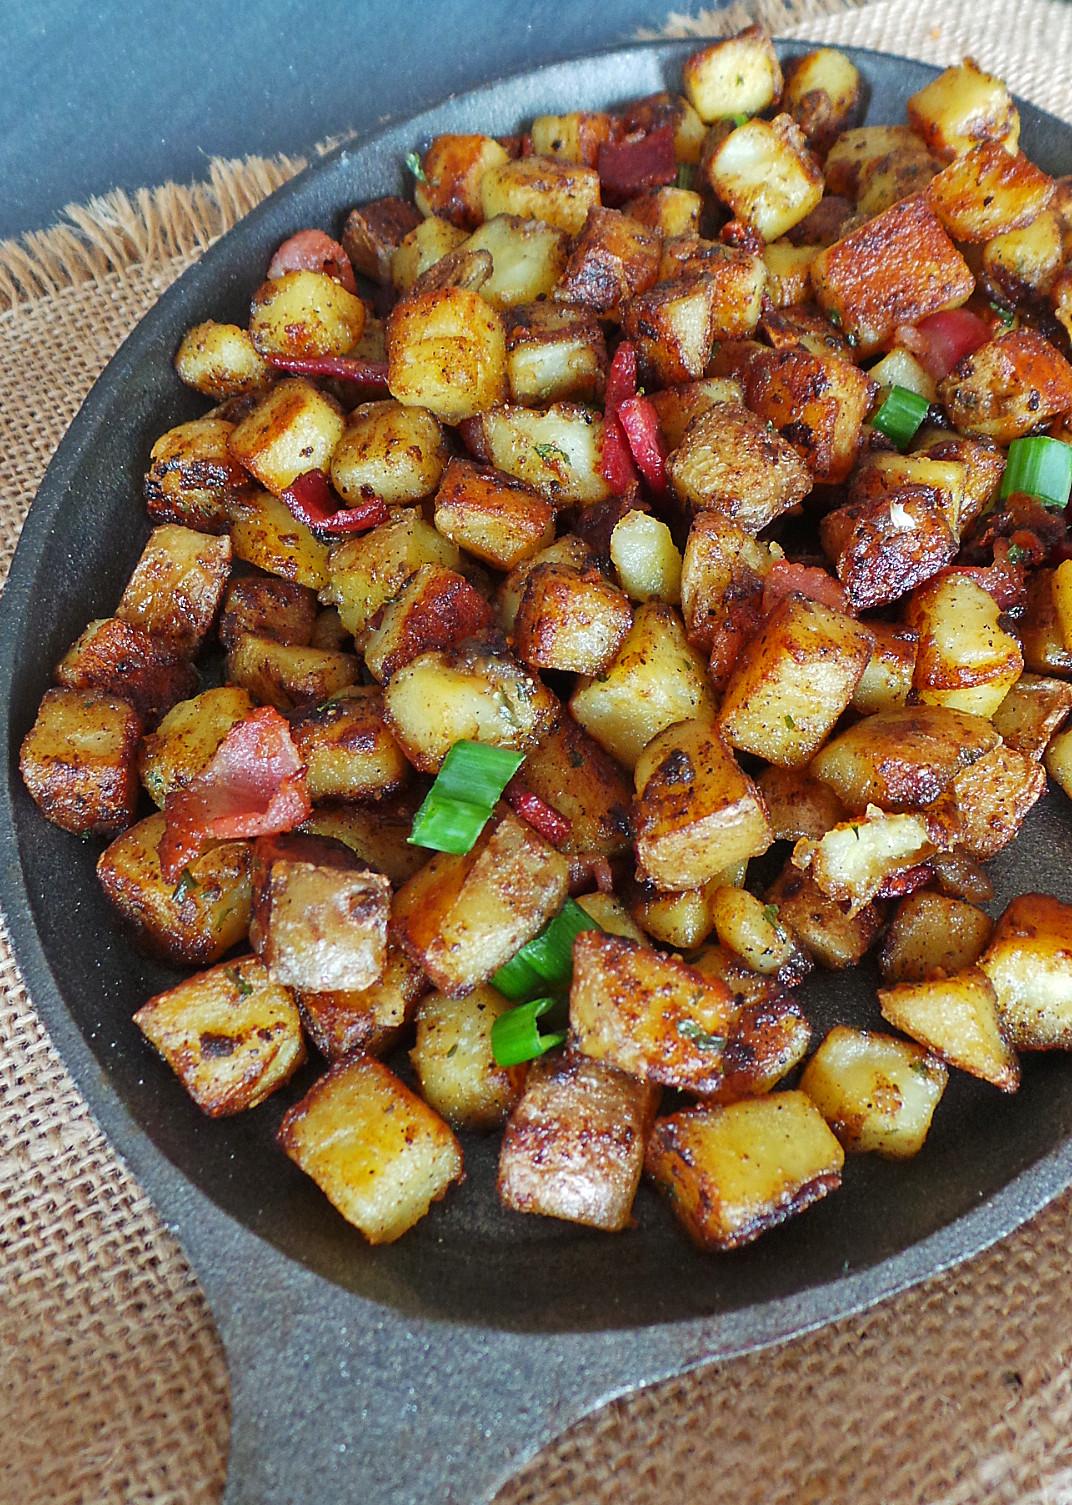 Potatoes Recipe For Breakfast  Bangin' Breakfast Potatoes